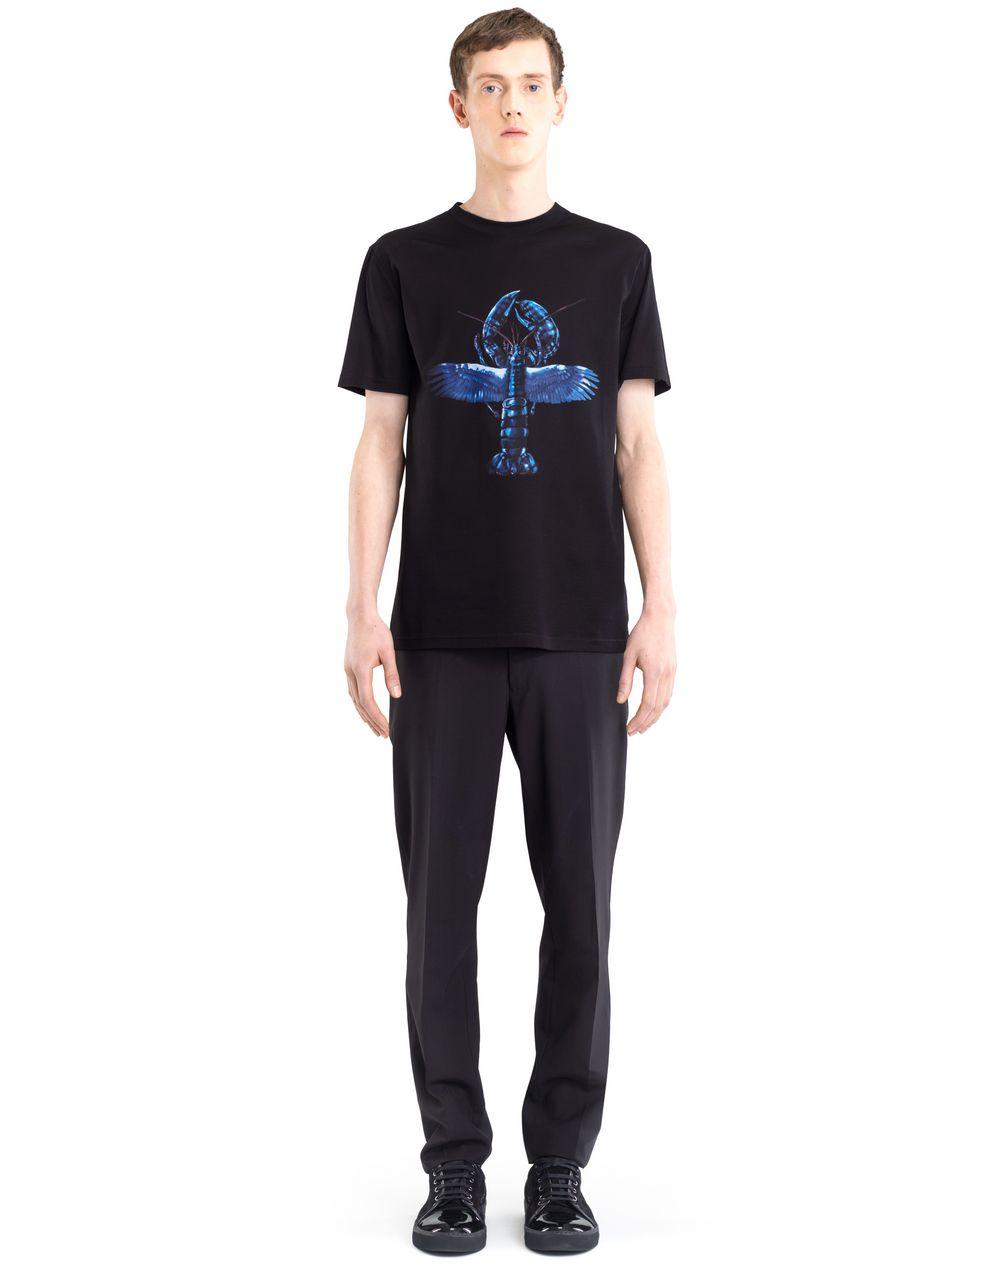 BLACK PRINTED T-SHIRT - Lanvin